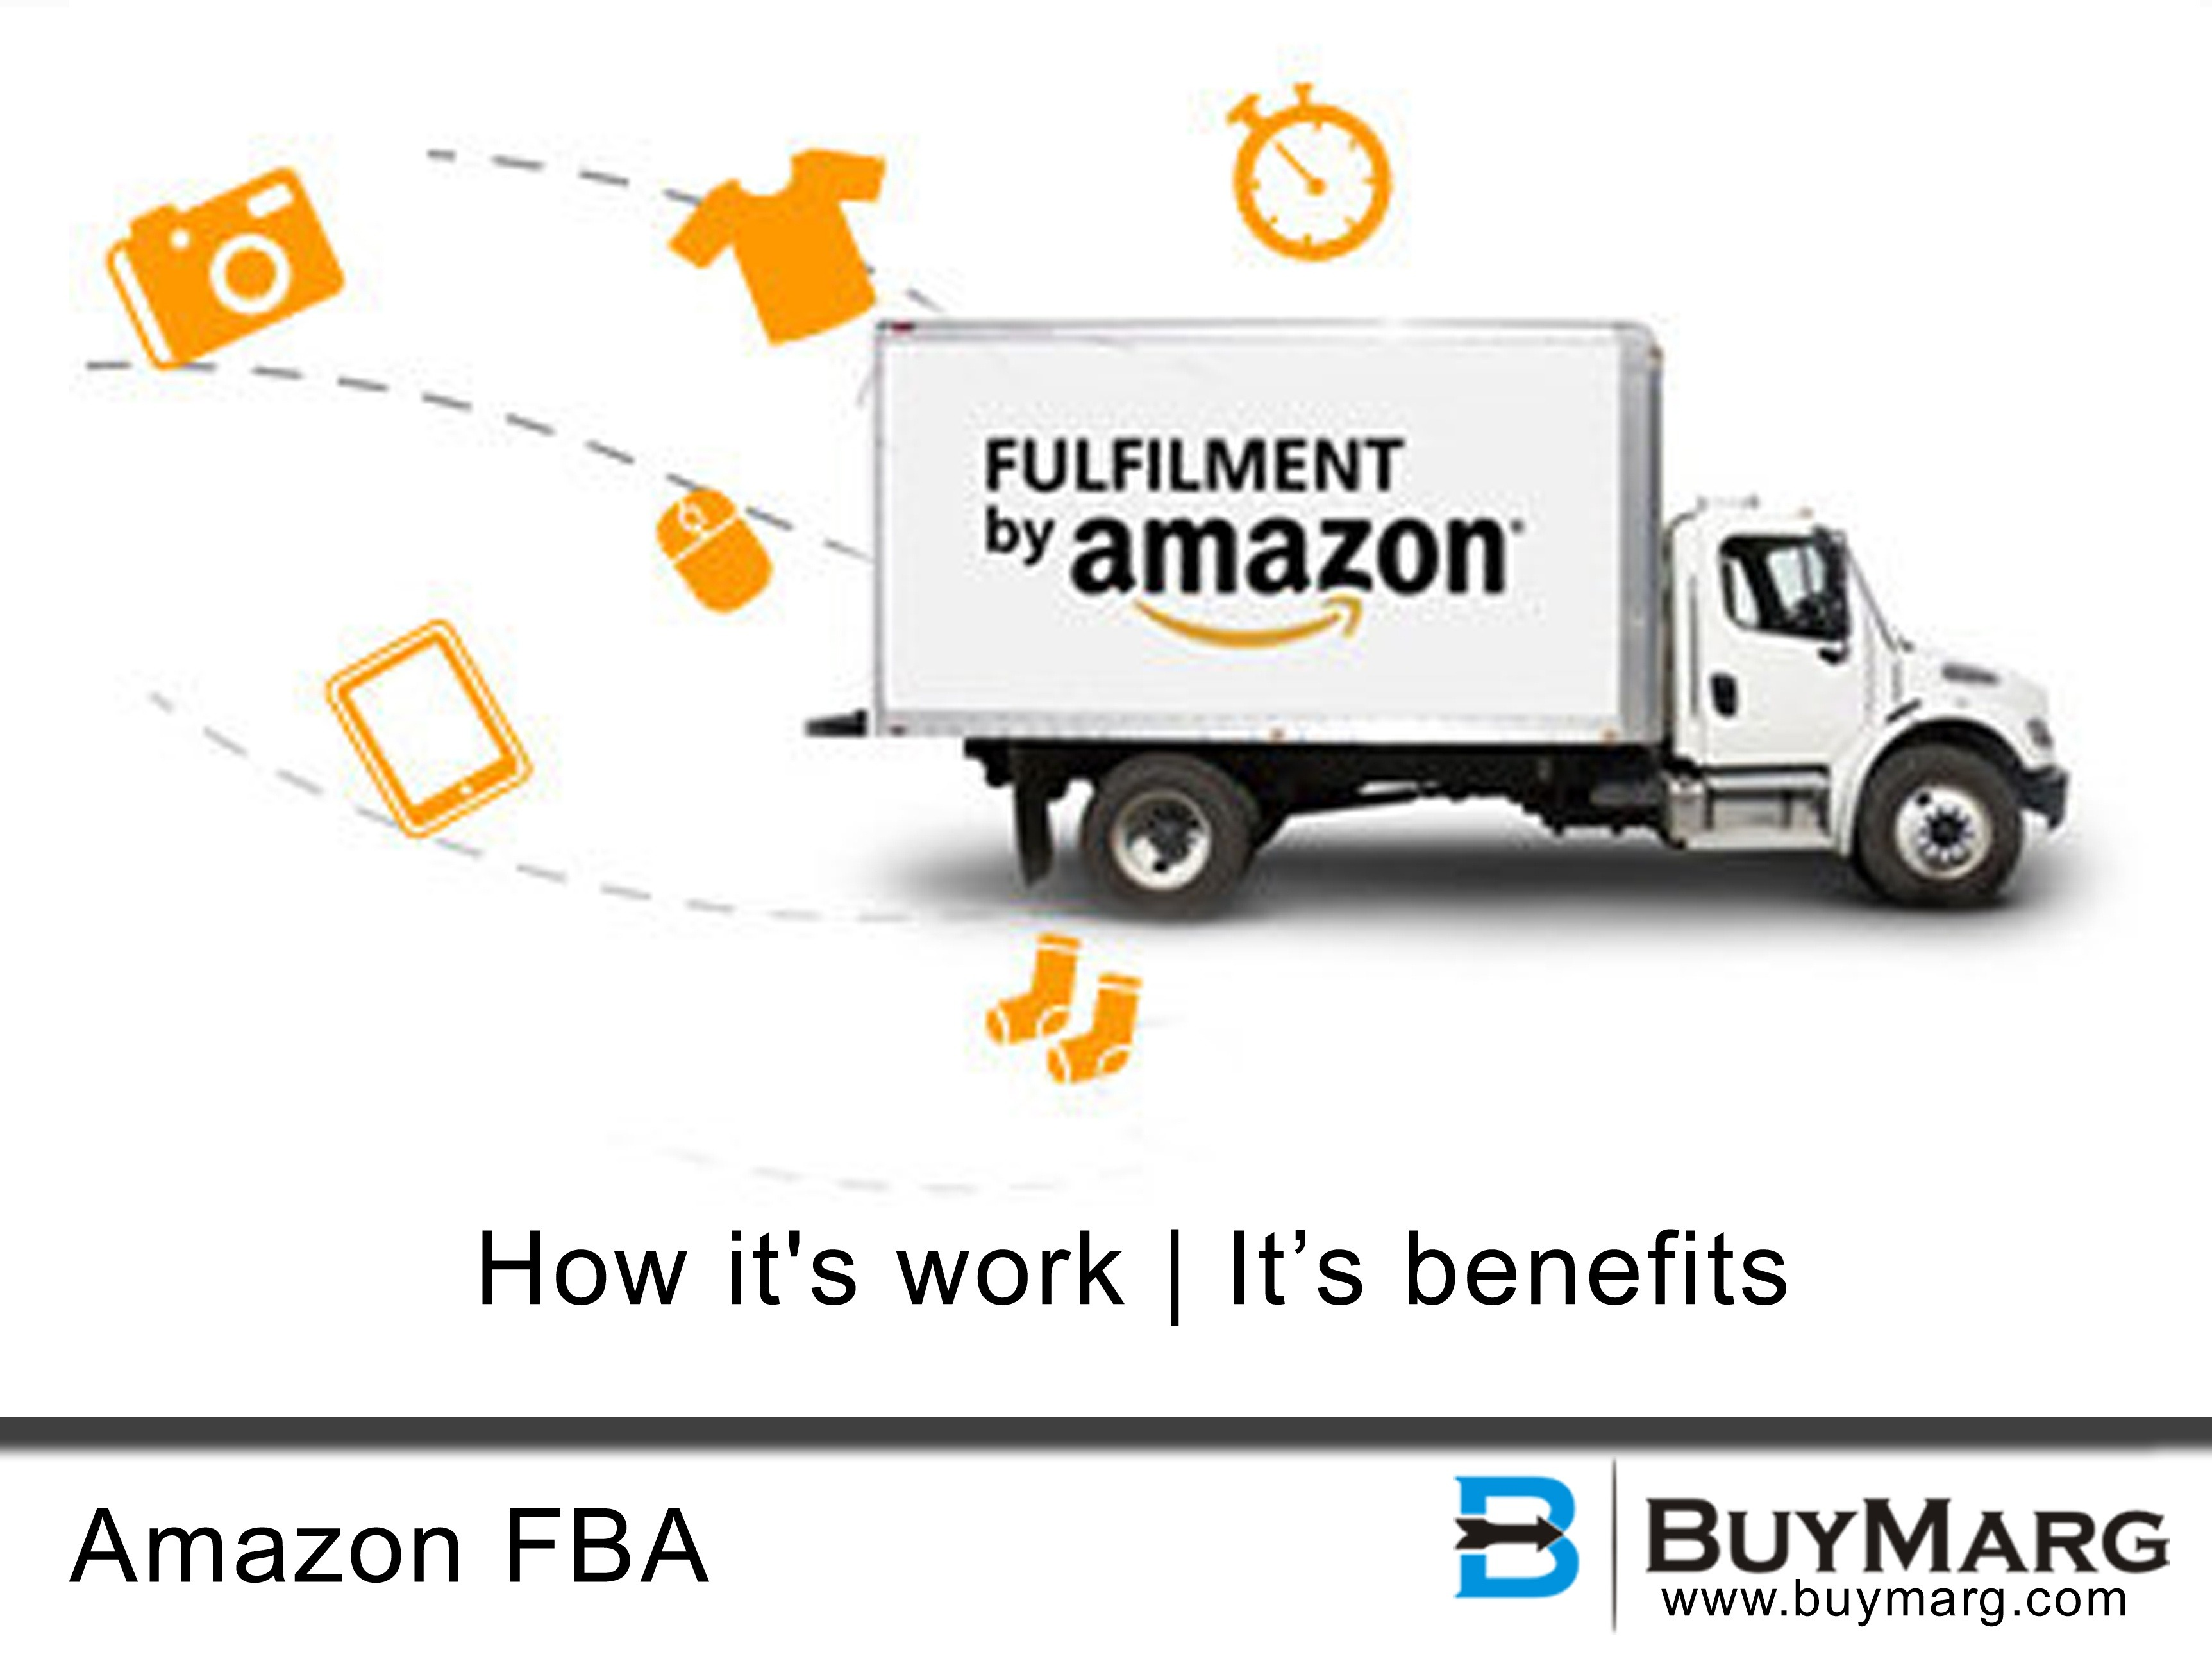 Amazon Money Back Guarantee Program Used In Craigslist